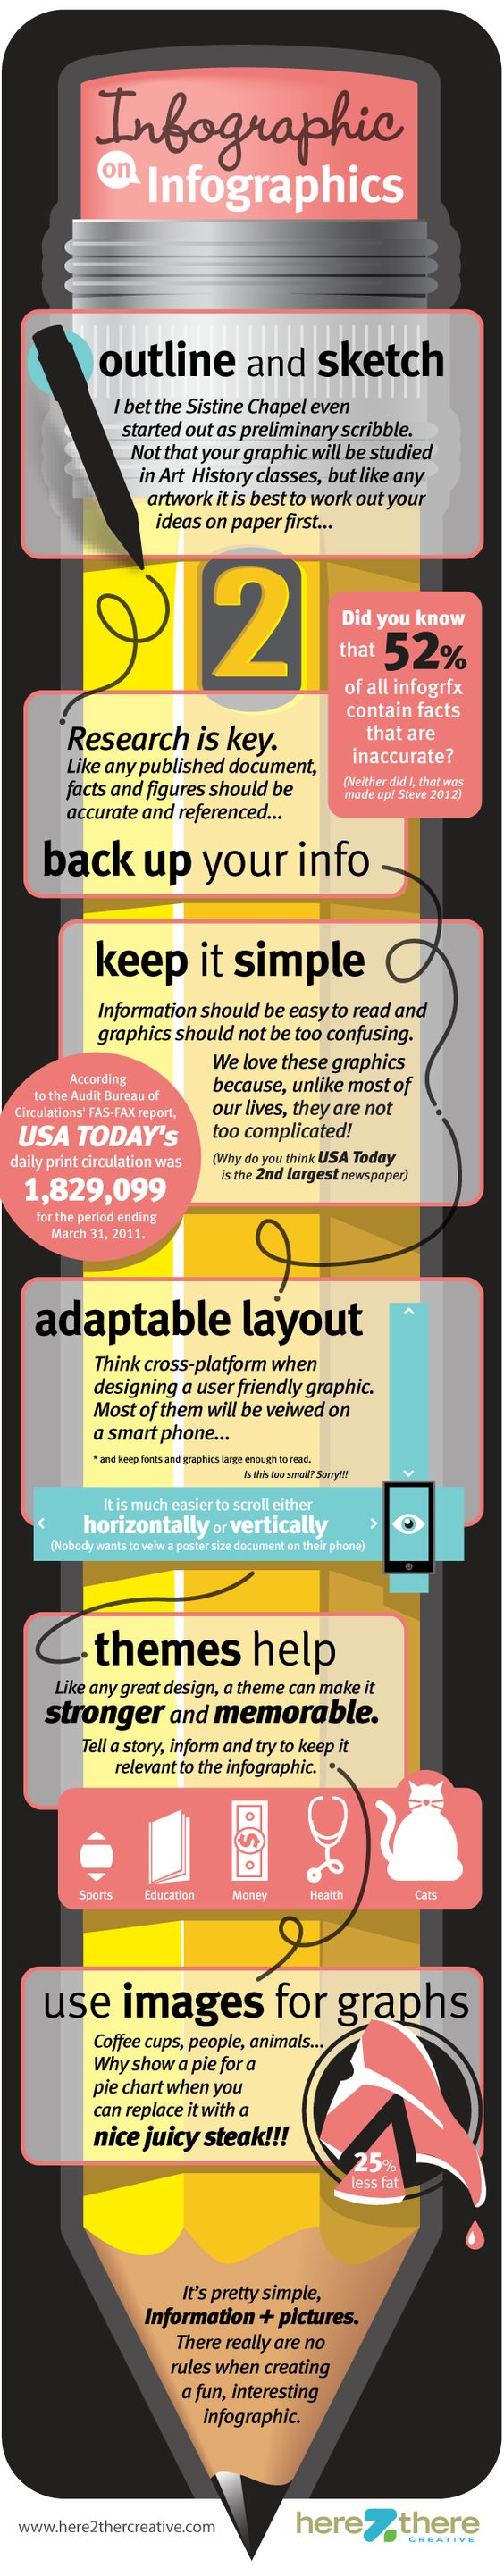 #Infographic on Infographics.